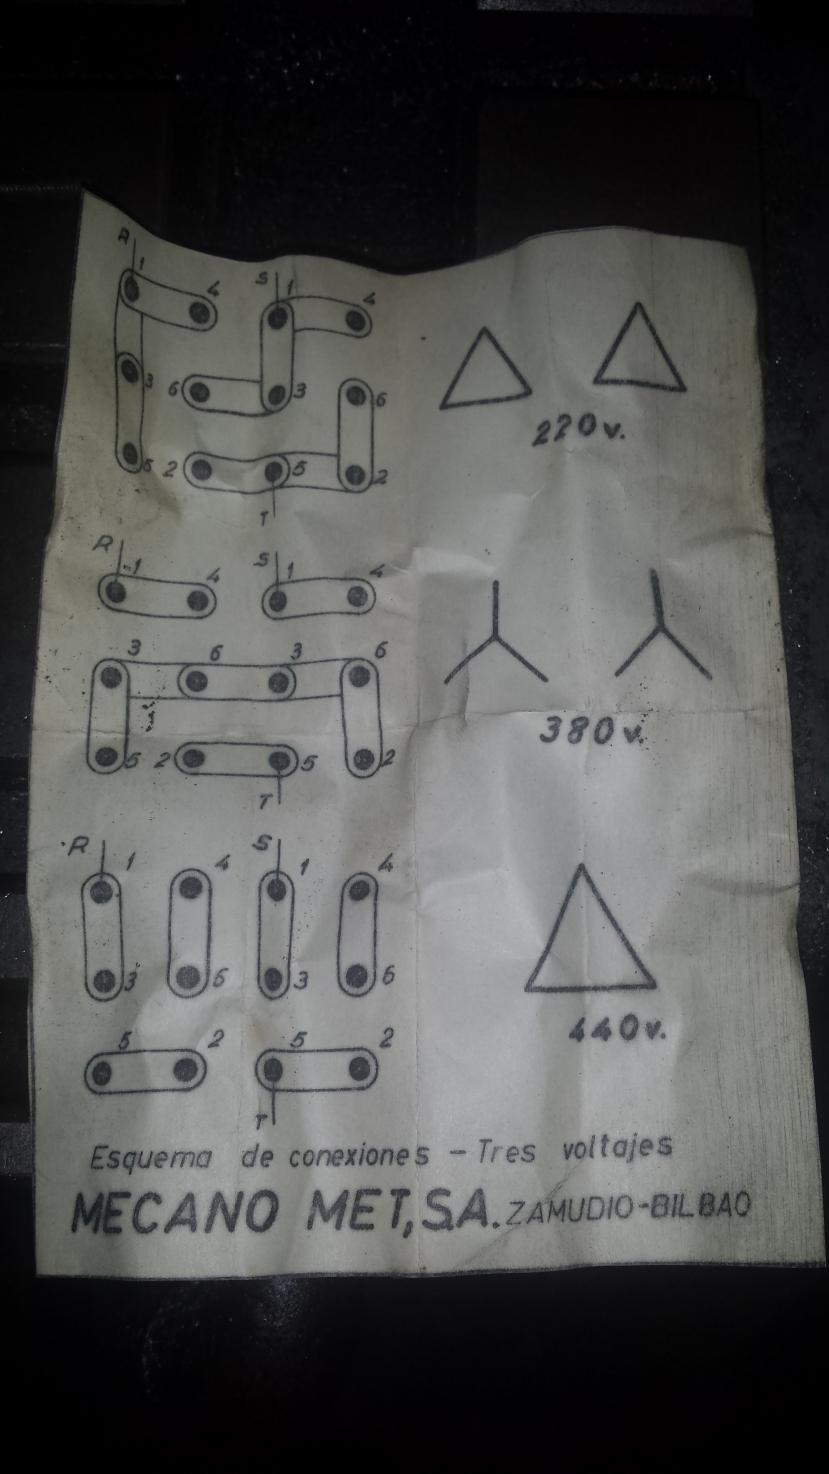 Supermax Wiring Diagram Detailed Schematics Uniden Solara Dsc Kondia Fv 1 Mill Questions Refrigerator